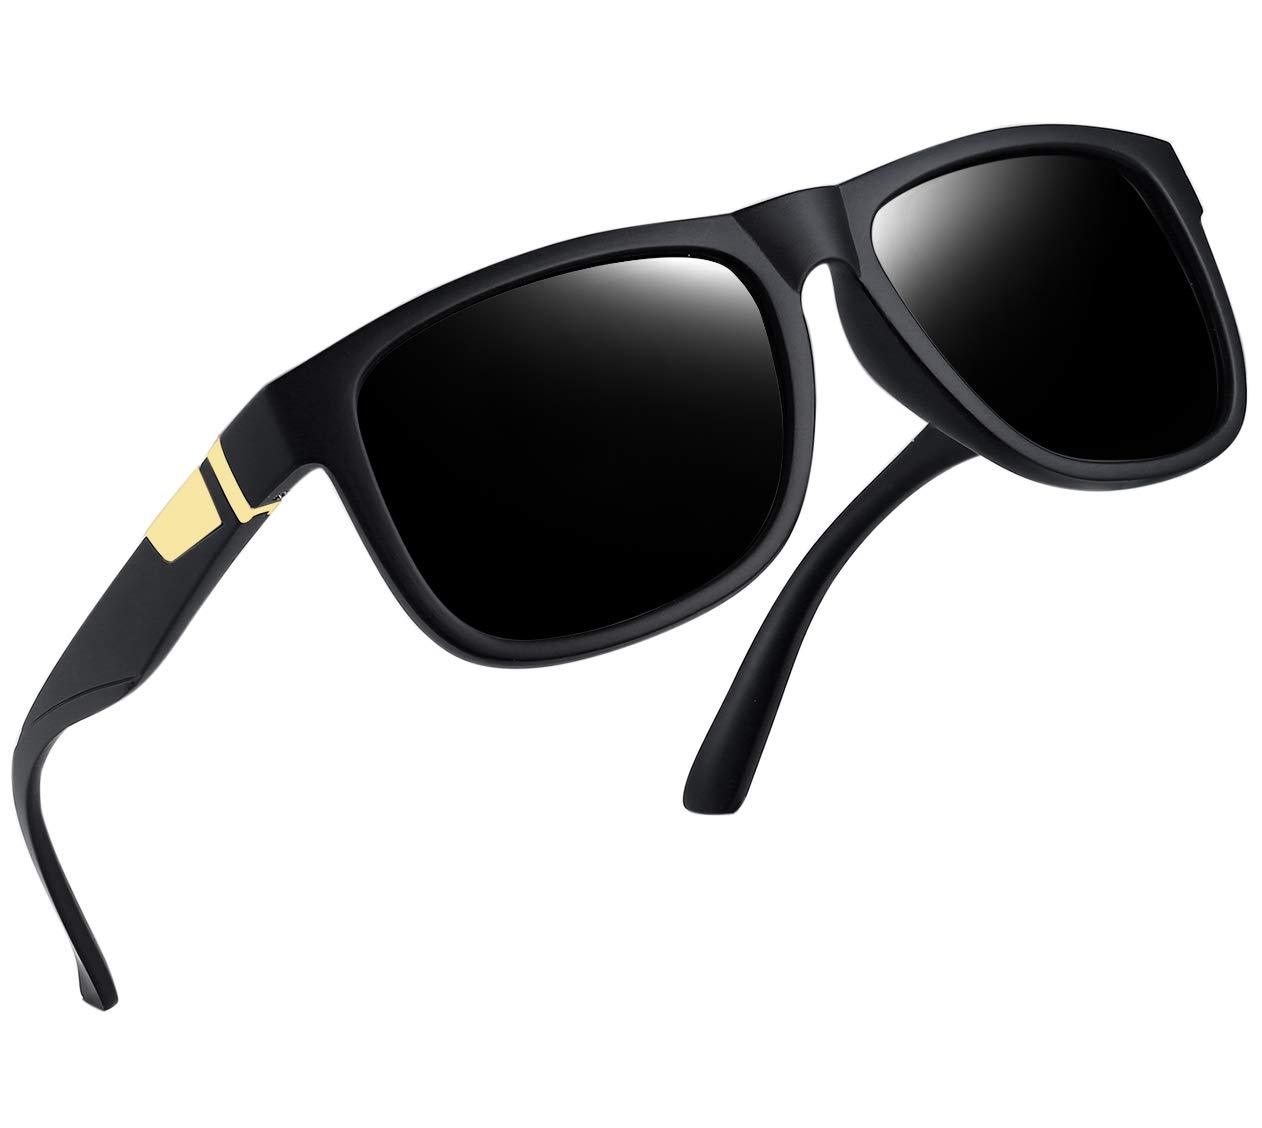 aadcebcceb7 Unisex Polarized Sunglasses Men Women Square Frame Sun Glasses 100% UV  Protection (Matte Black